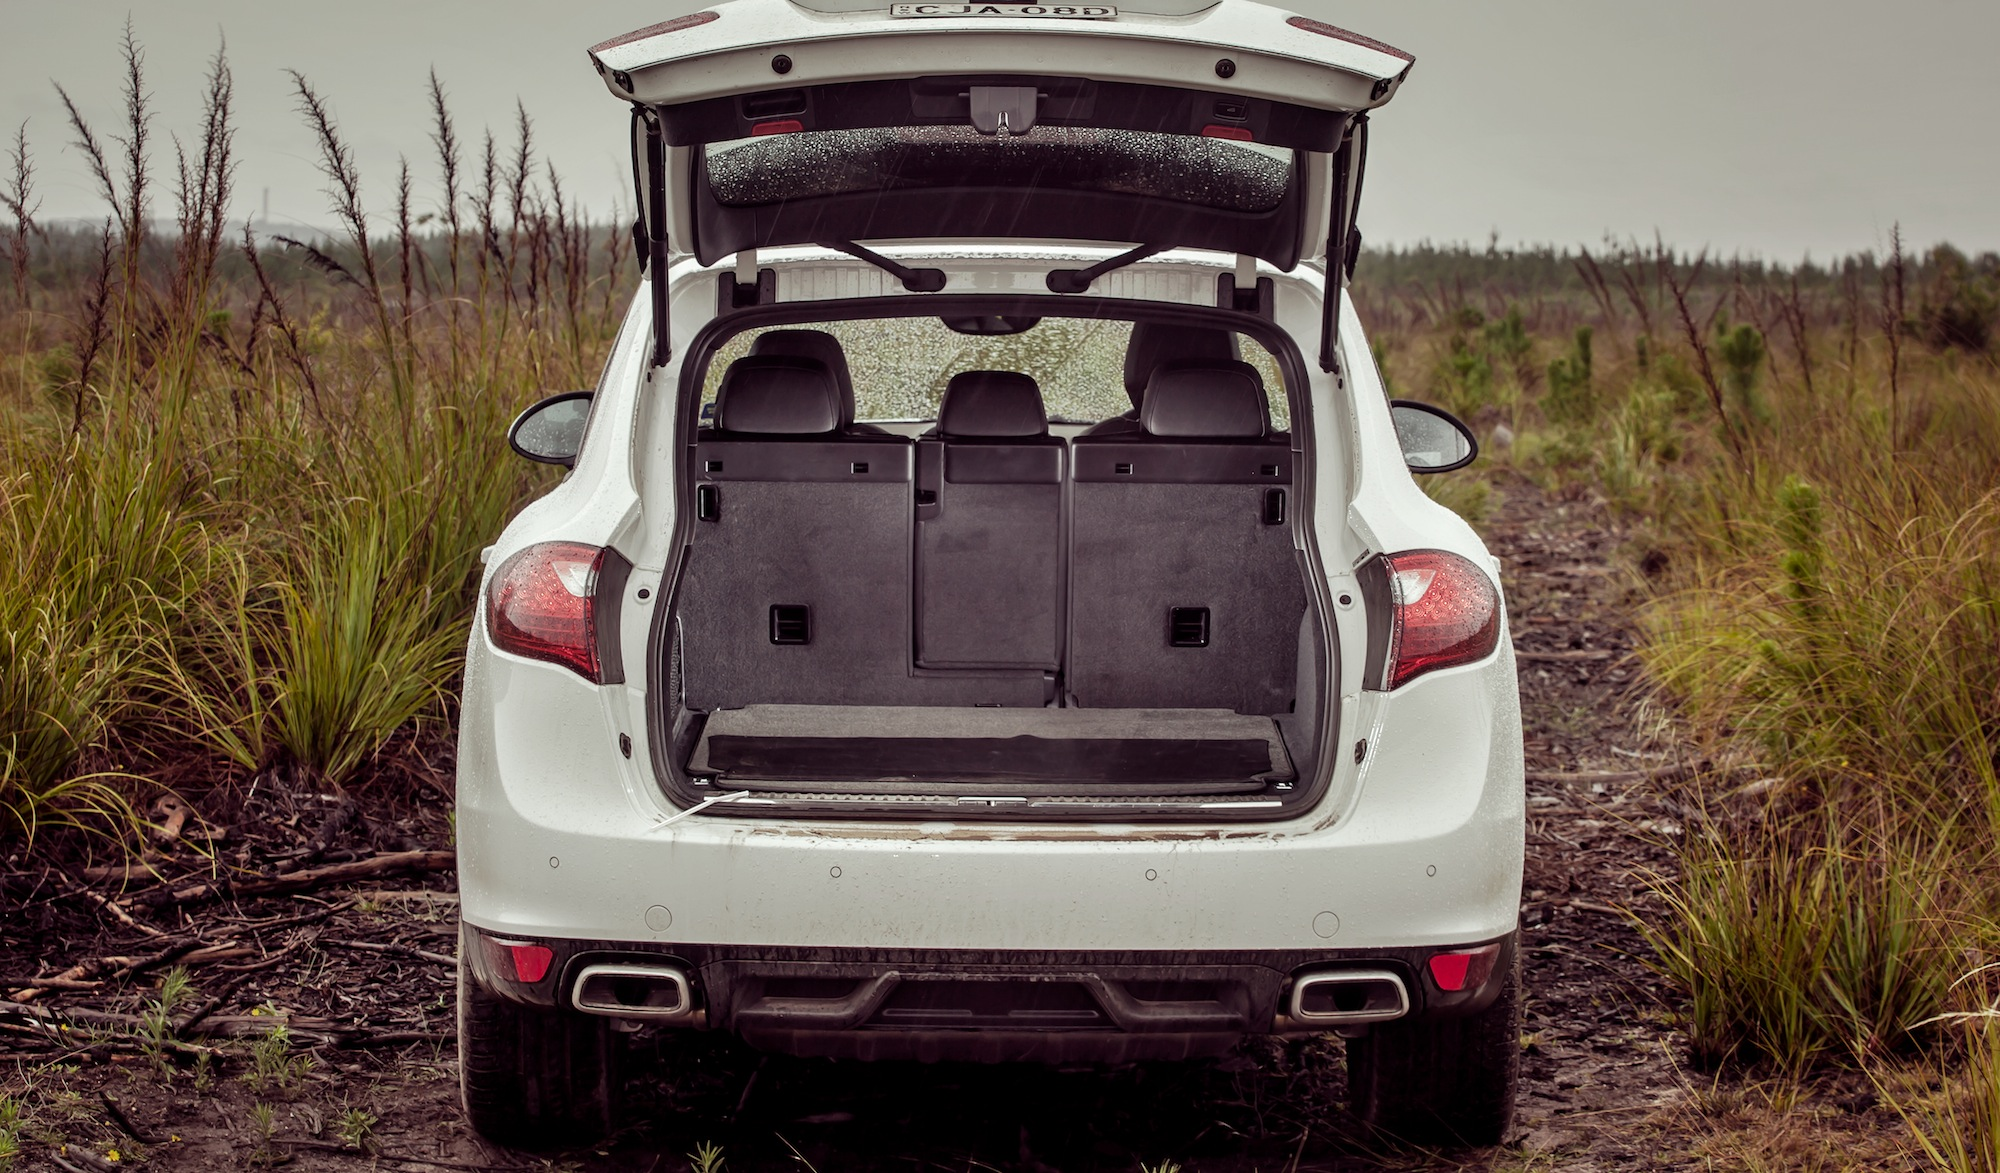 luxury suv comparison : bmw x5 v mercedes-benz ml-class v range